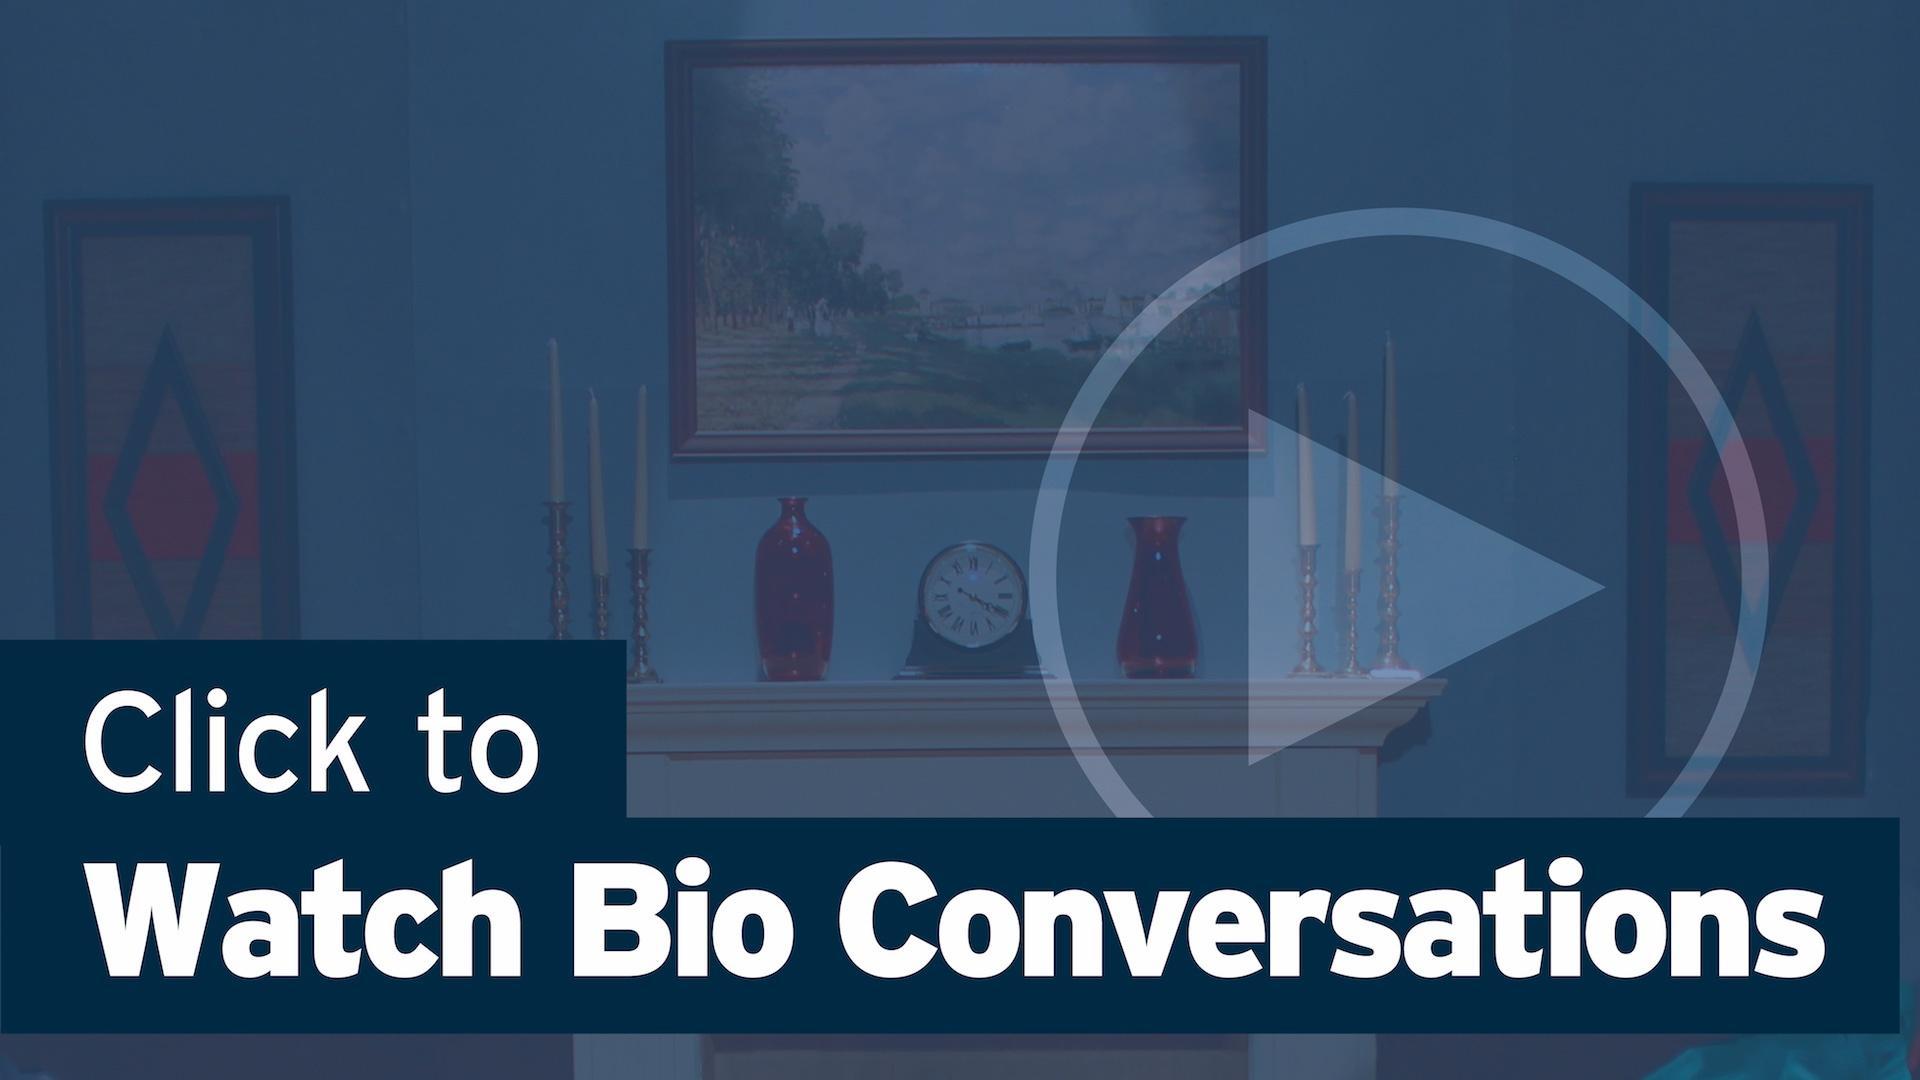 Click Here to Watch Bio Conversations